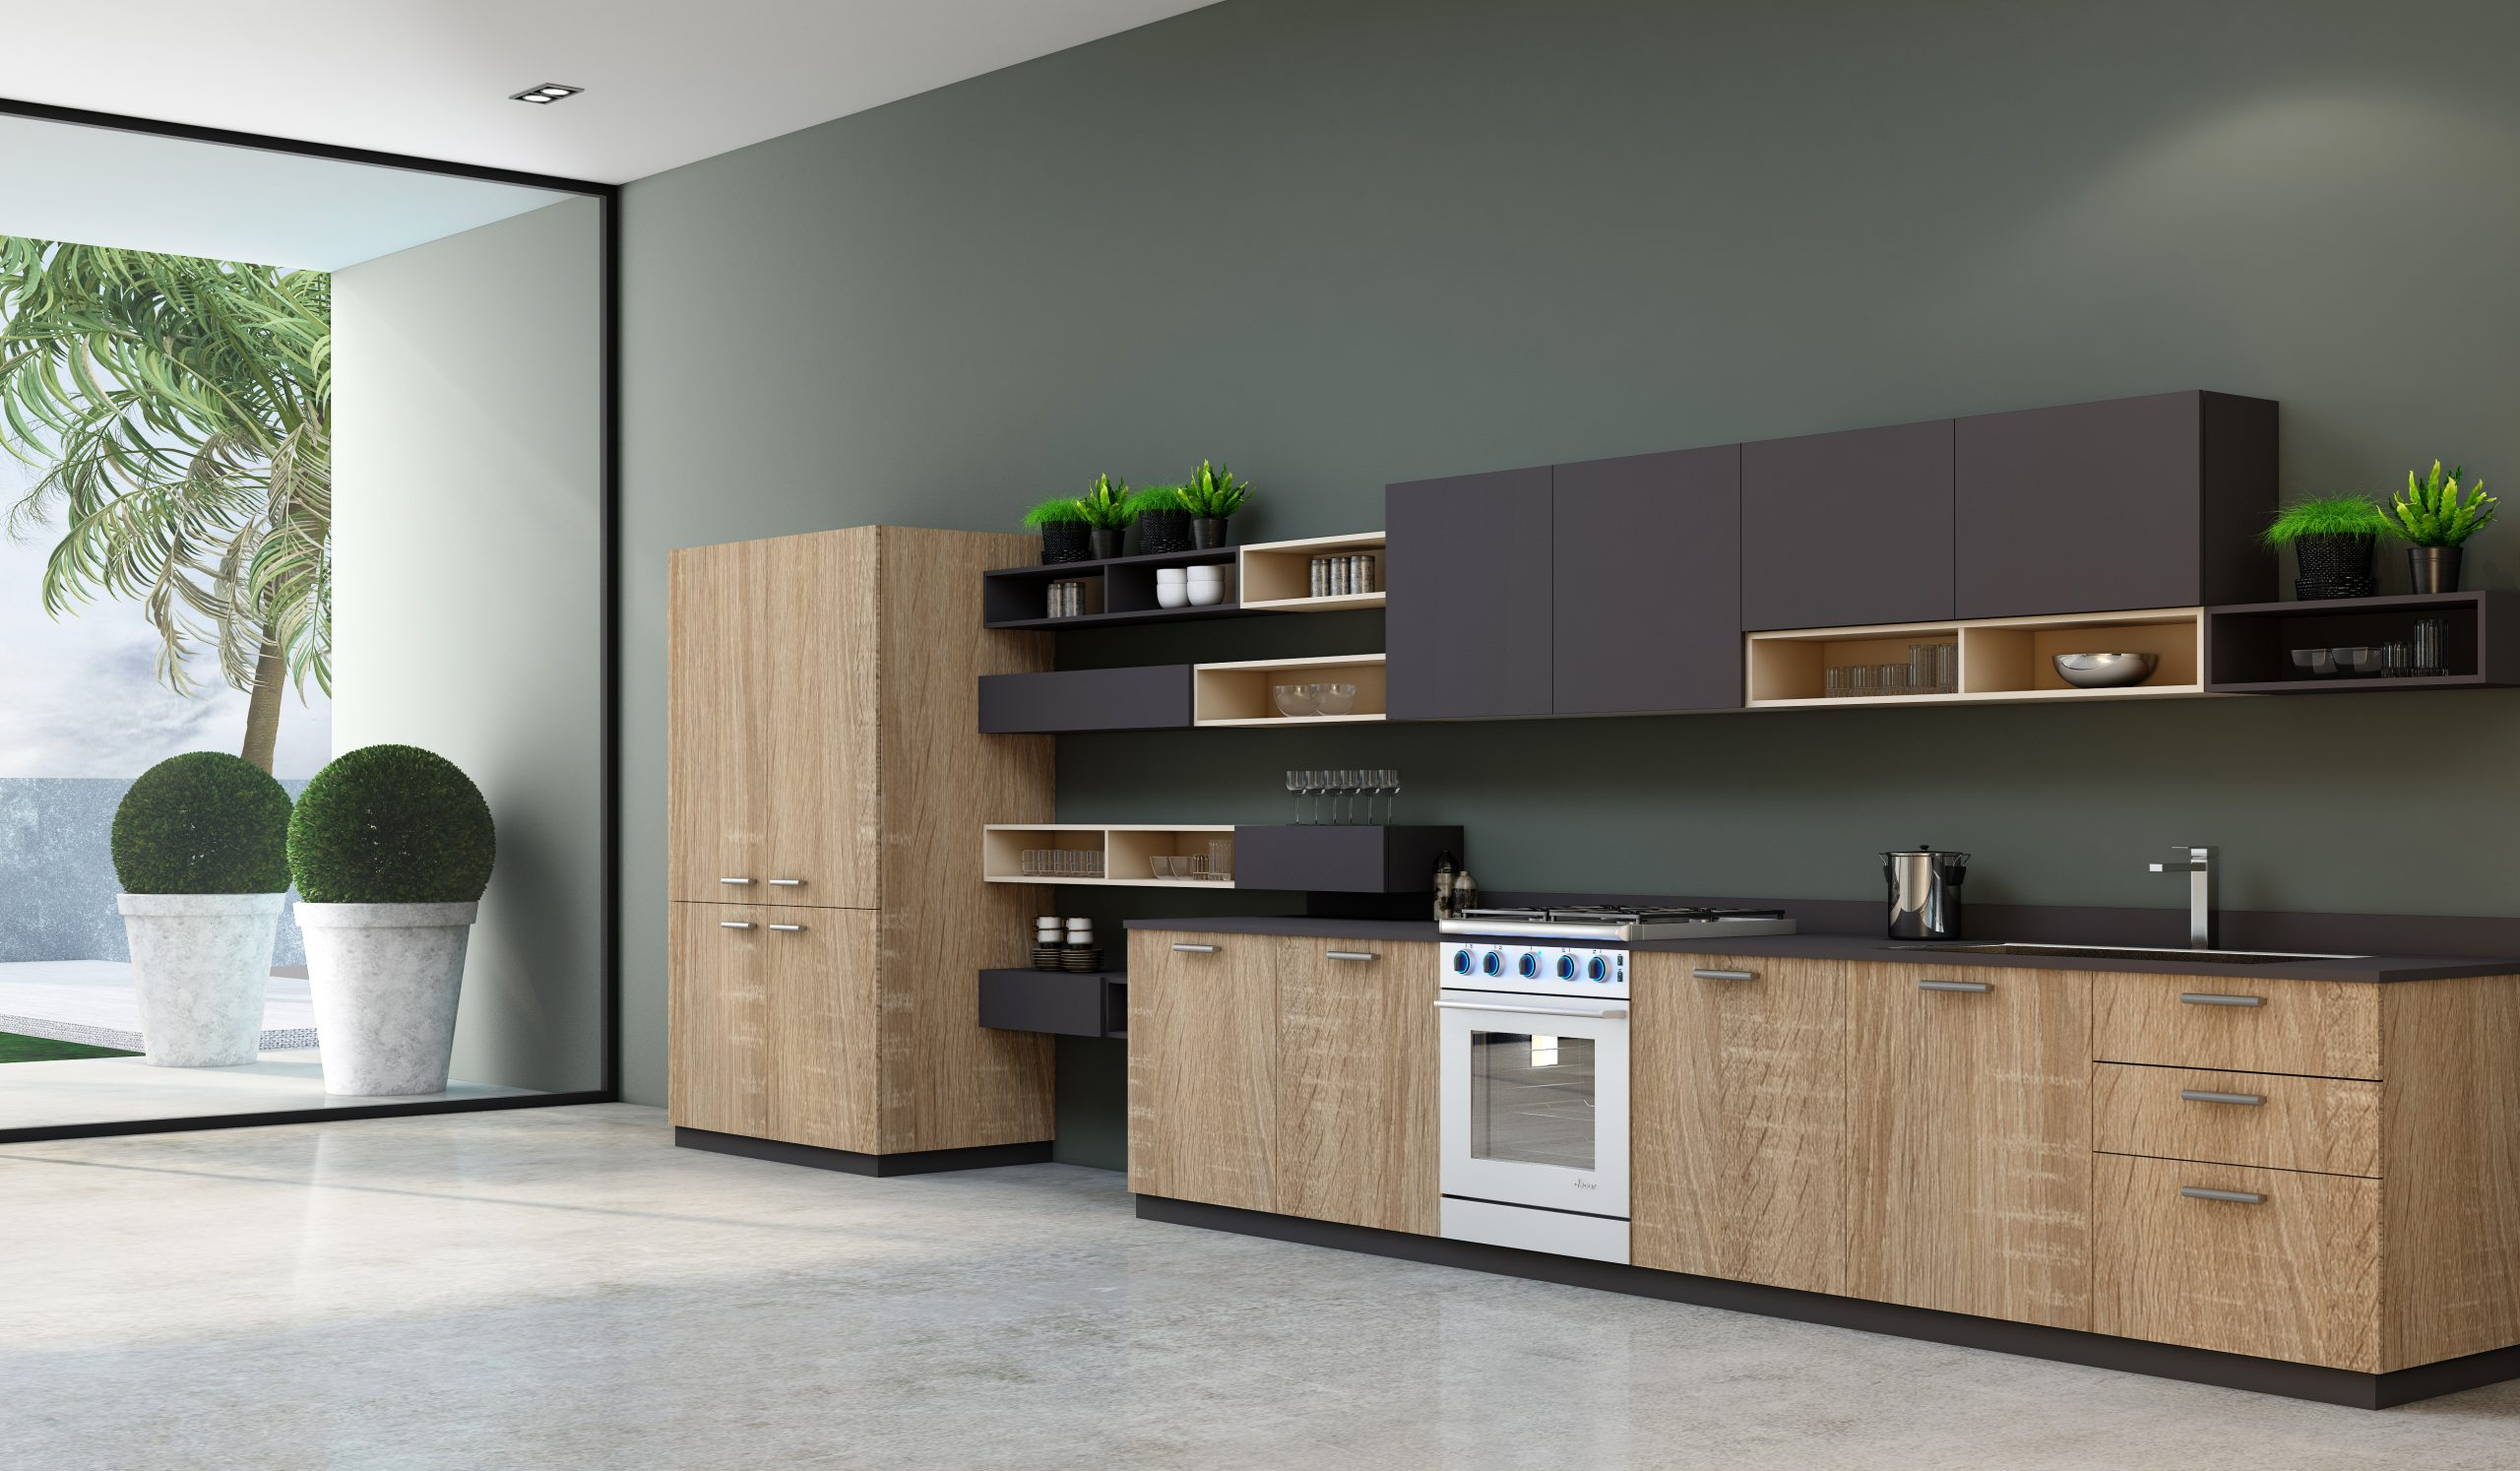 Easyline green kitchen with Alcove in Sand Orleans Oak woodgrain & graphite grey matt finish